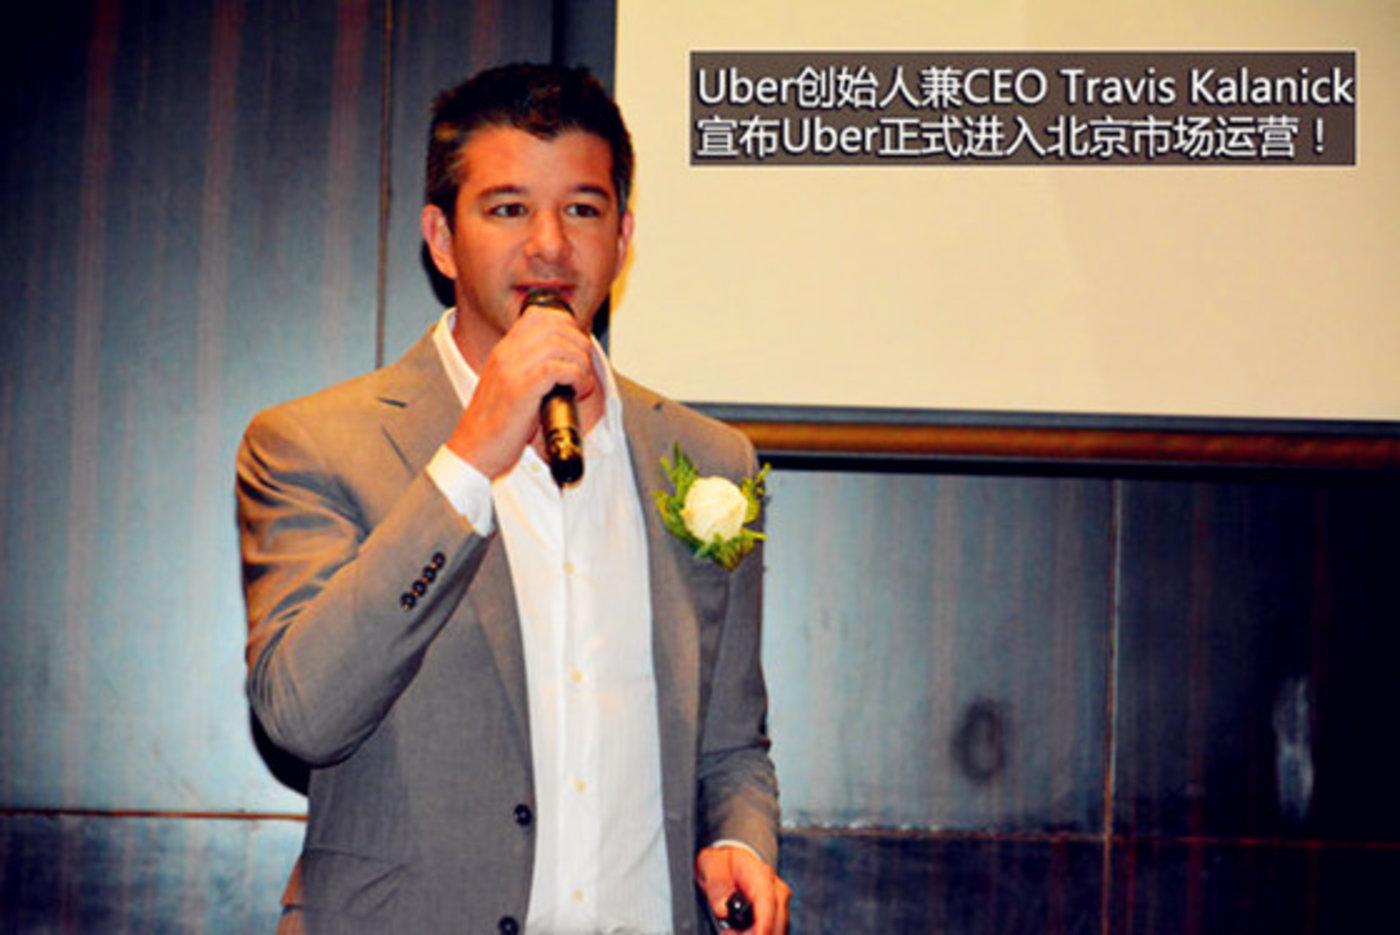 Uber联合创始人